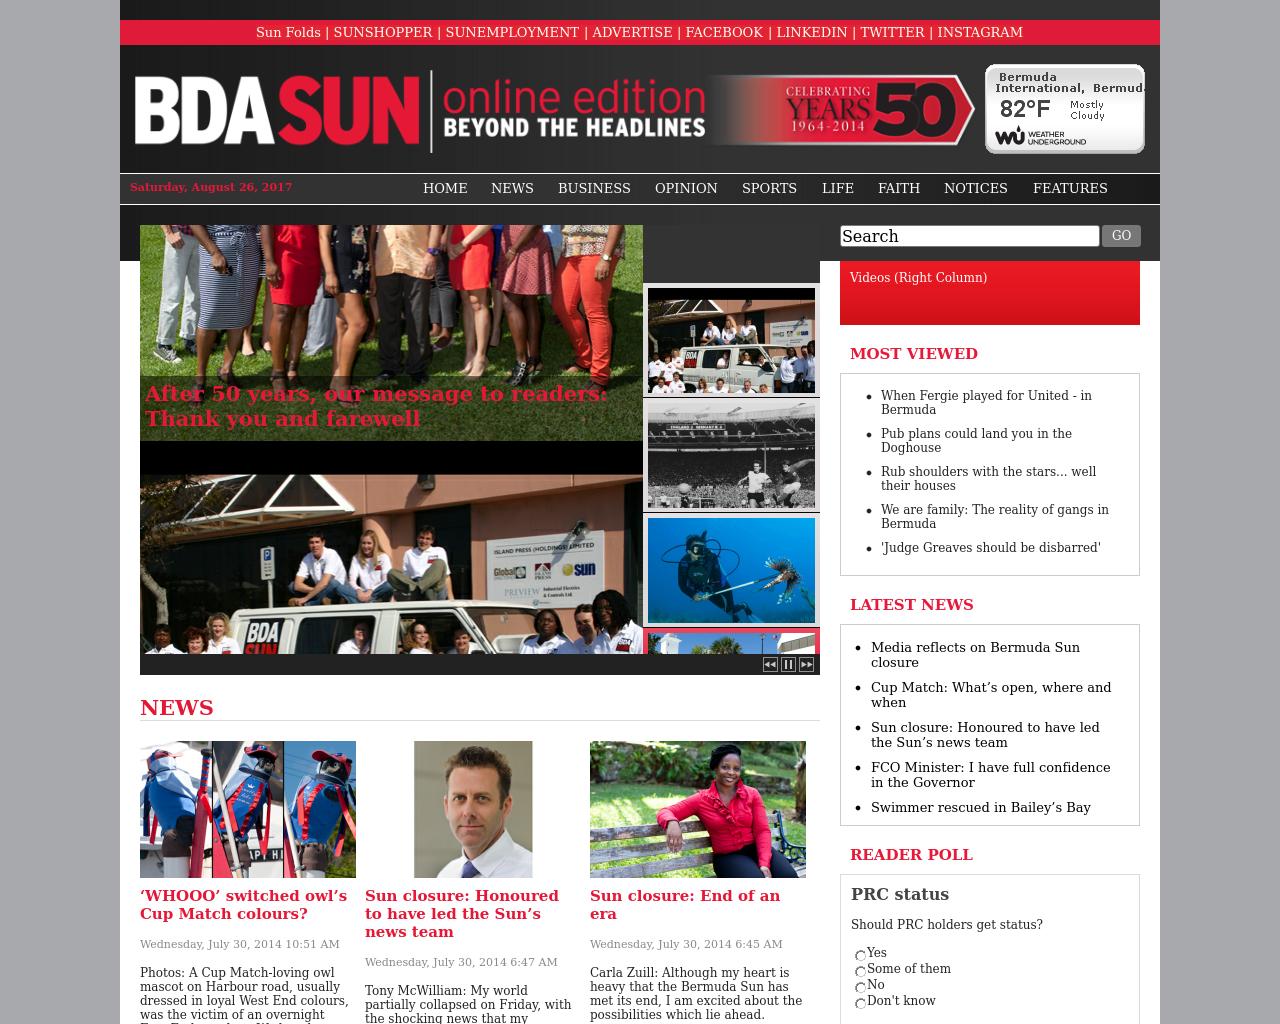 BDA-Sun-Advertising-Reviews-Pricing